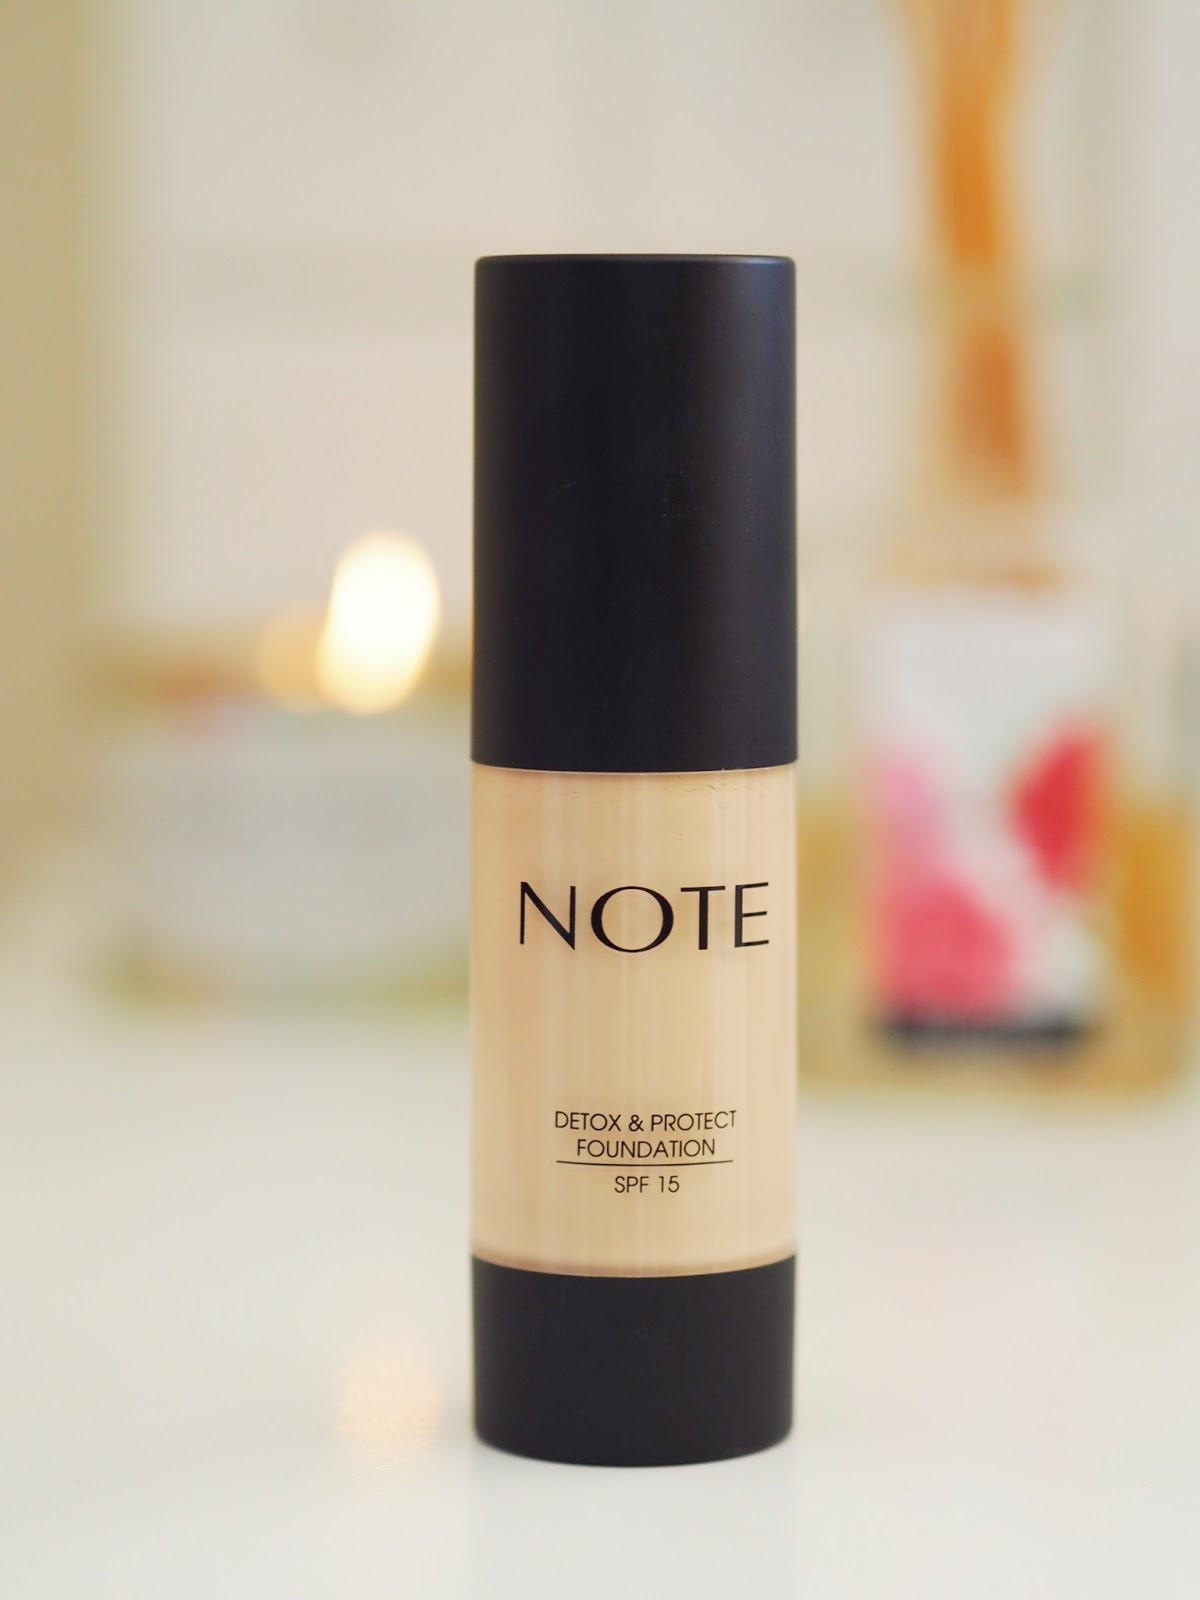 Five Note Cosmetics Foundations Review Comparison